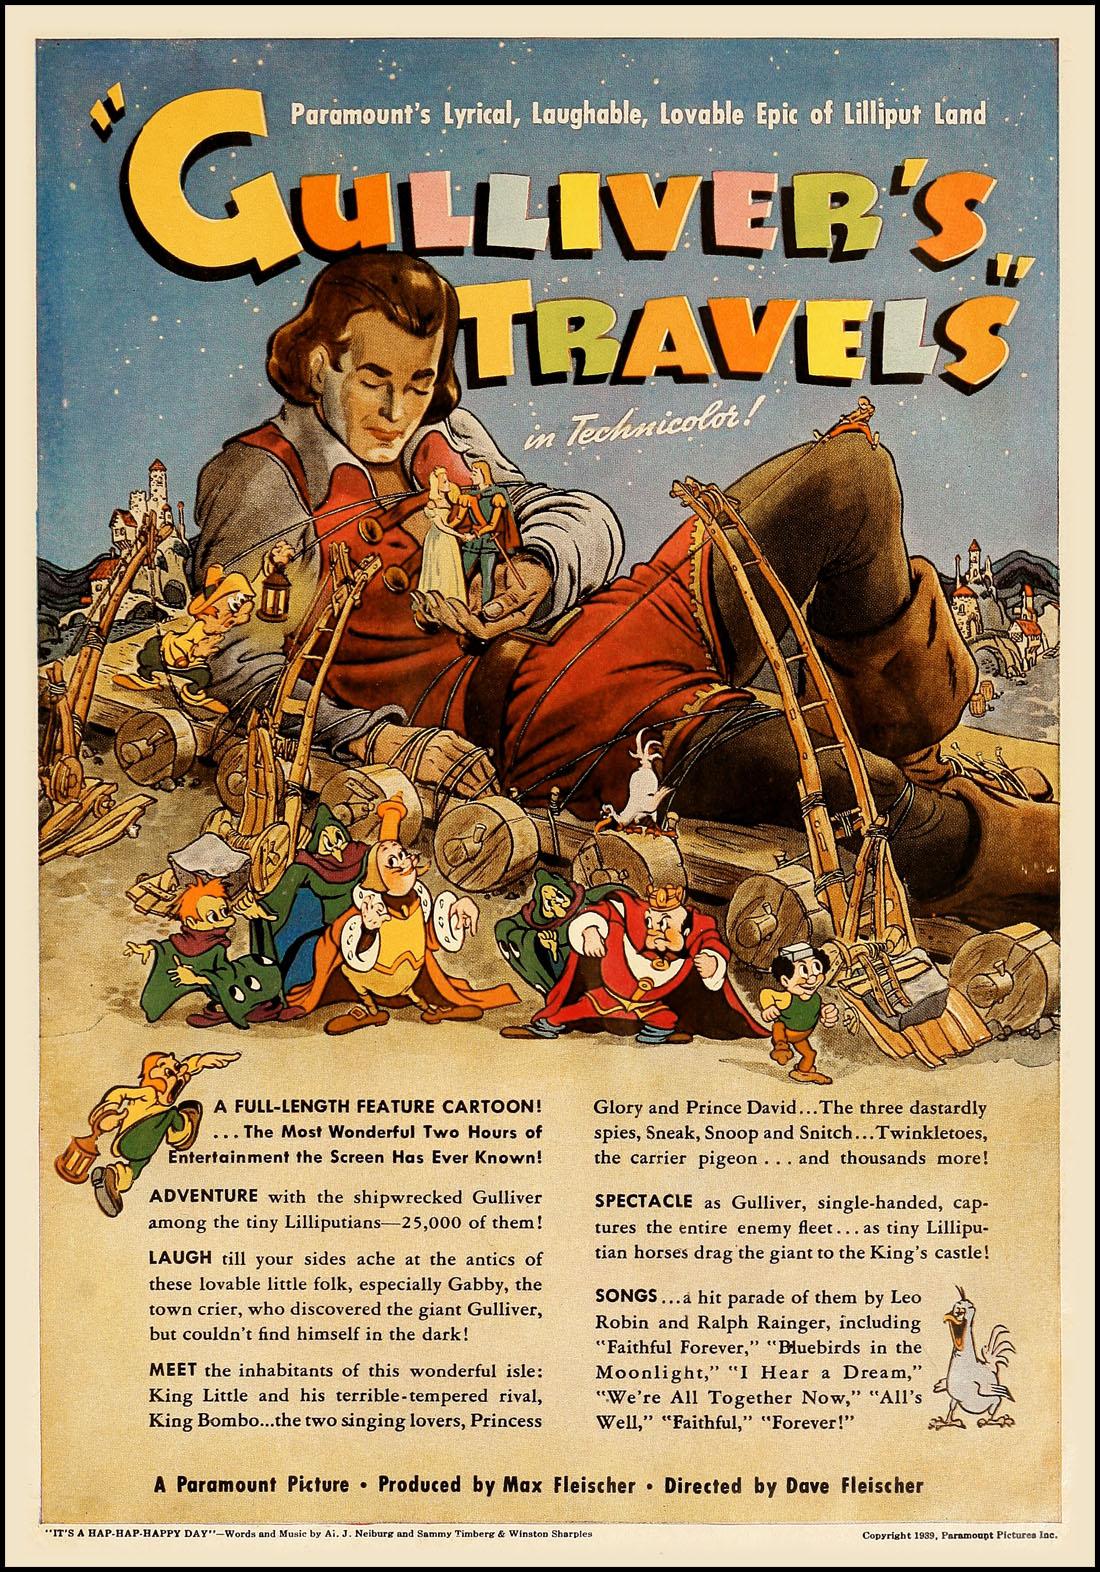 Gulliver's Travels Themes